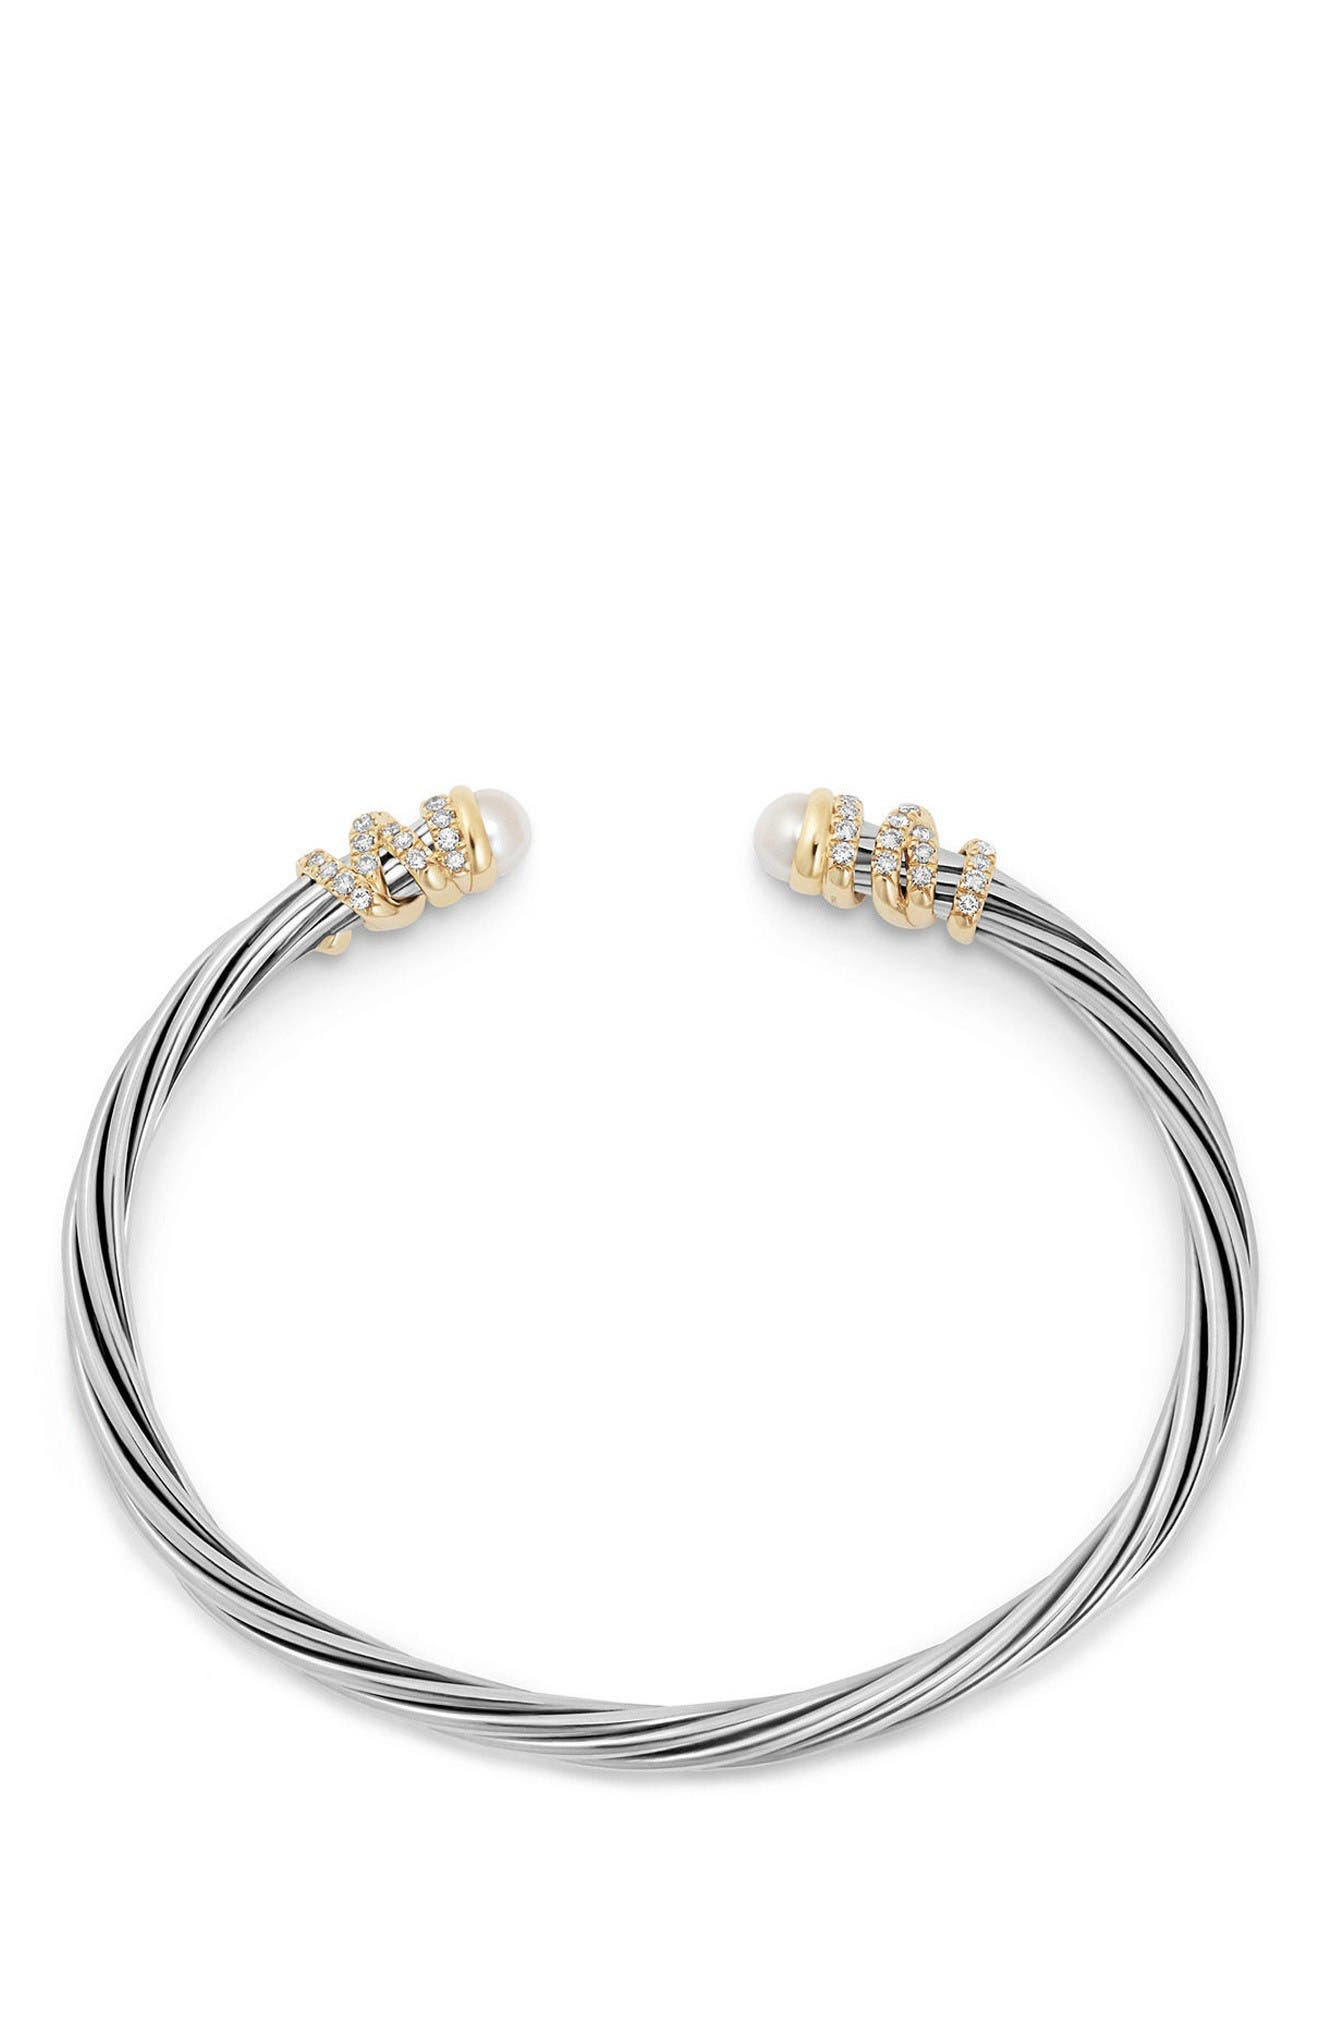 Alternate Image 2  - David Yurman Helena End Station Bracelet with Pearls & Diamonds, 4mm